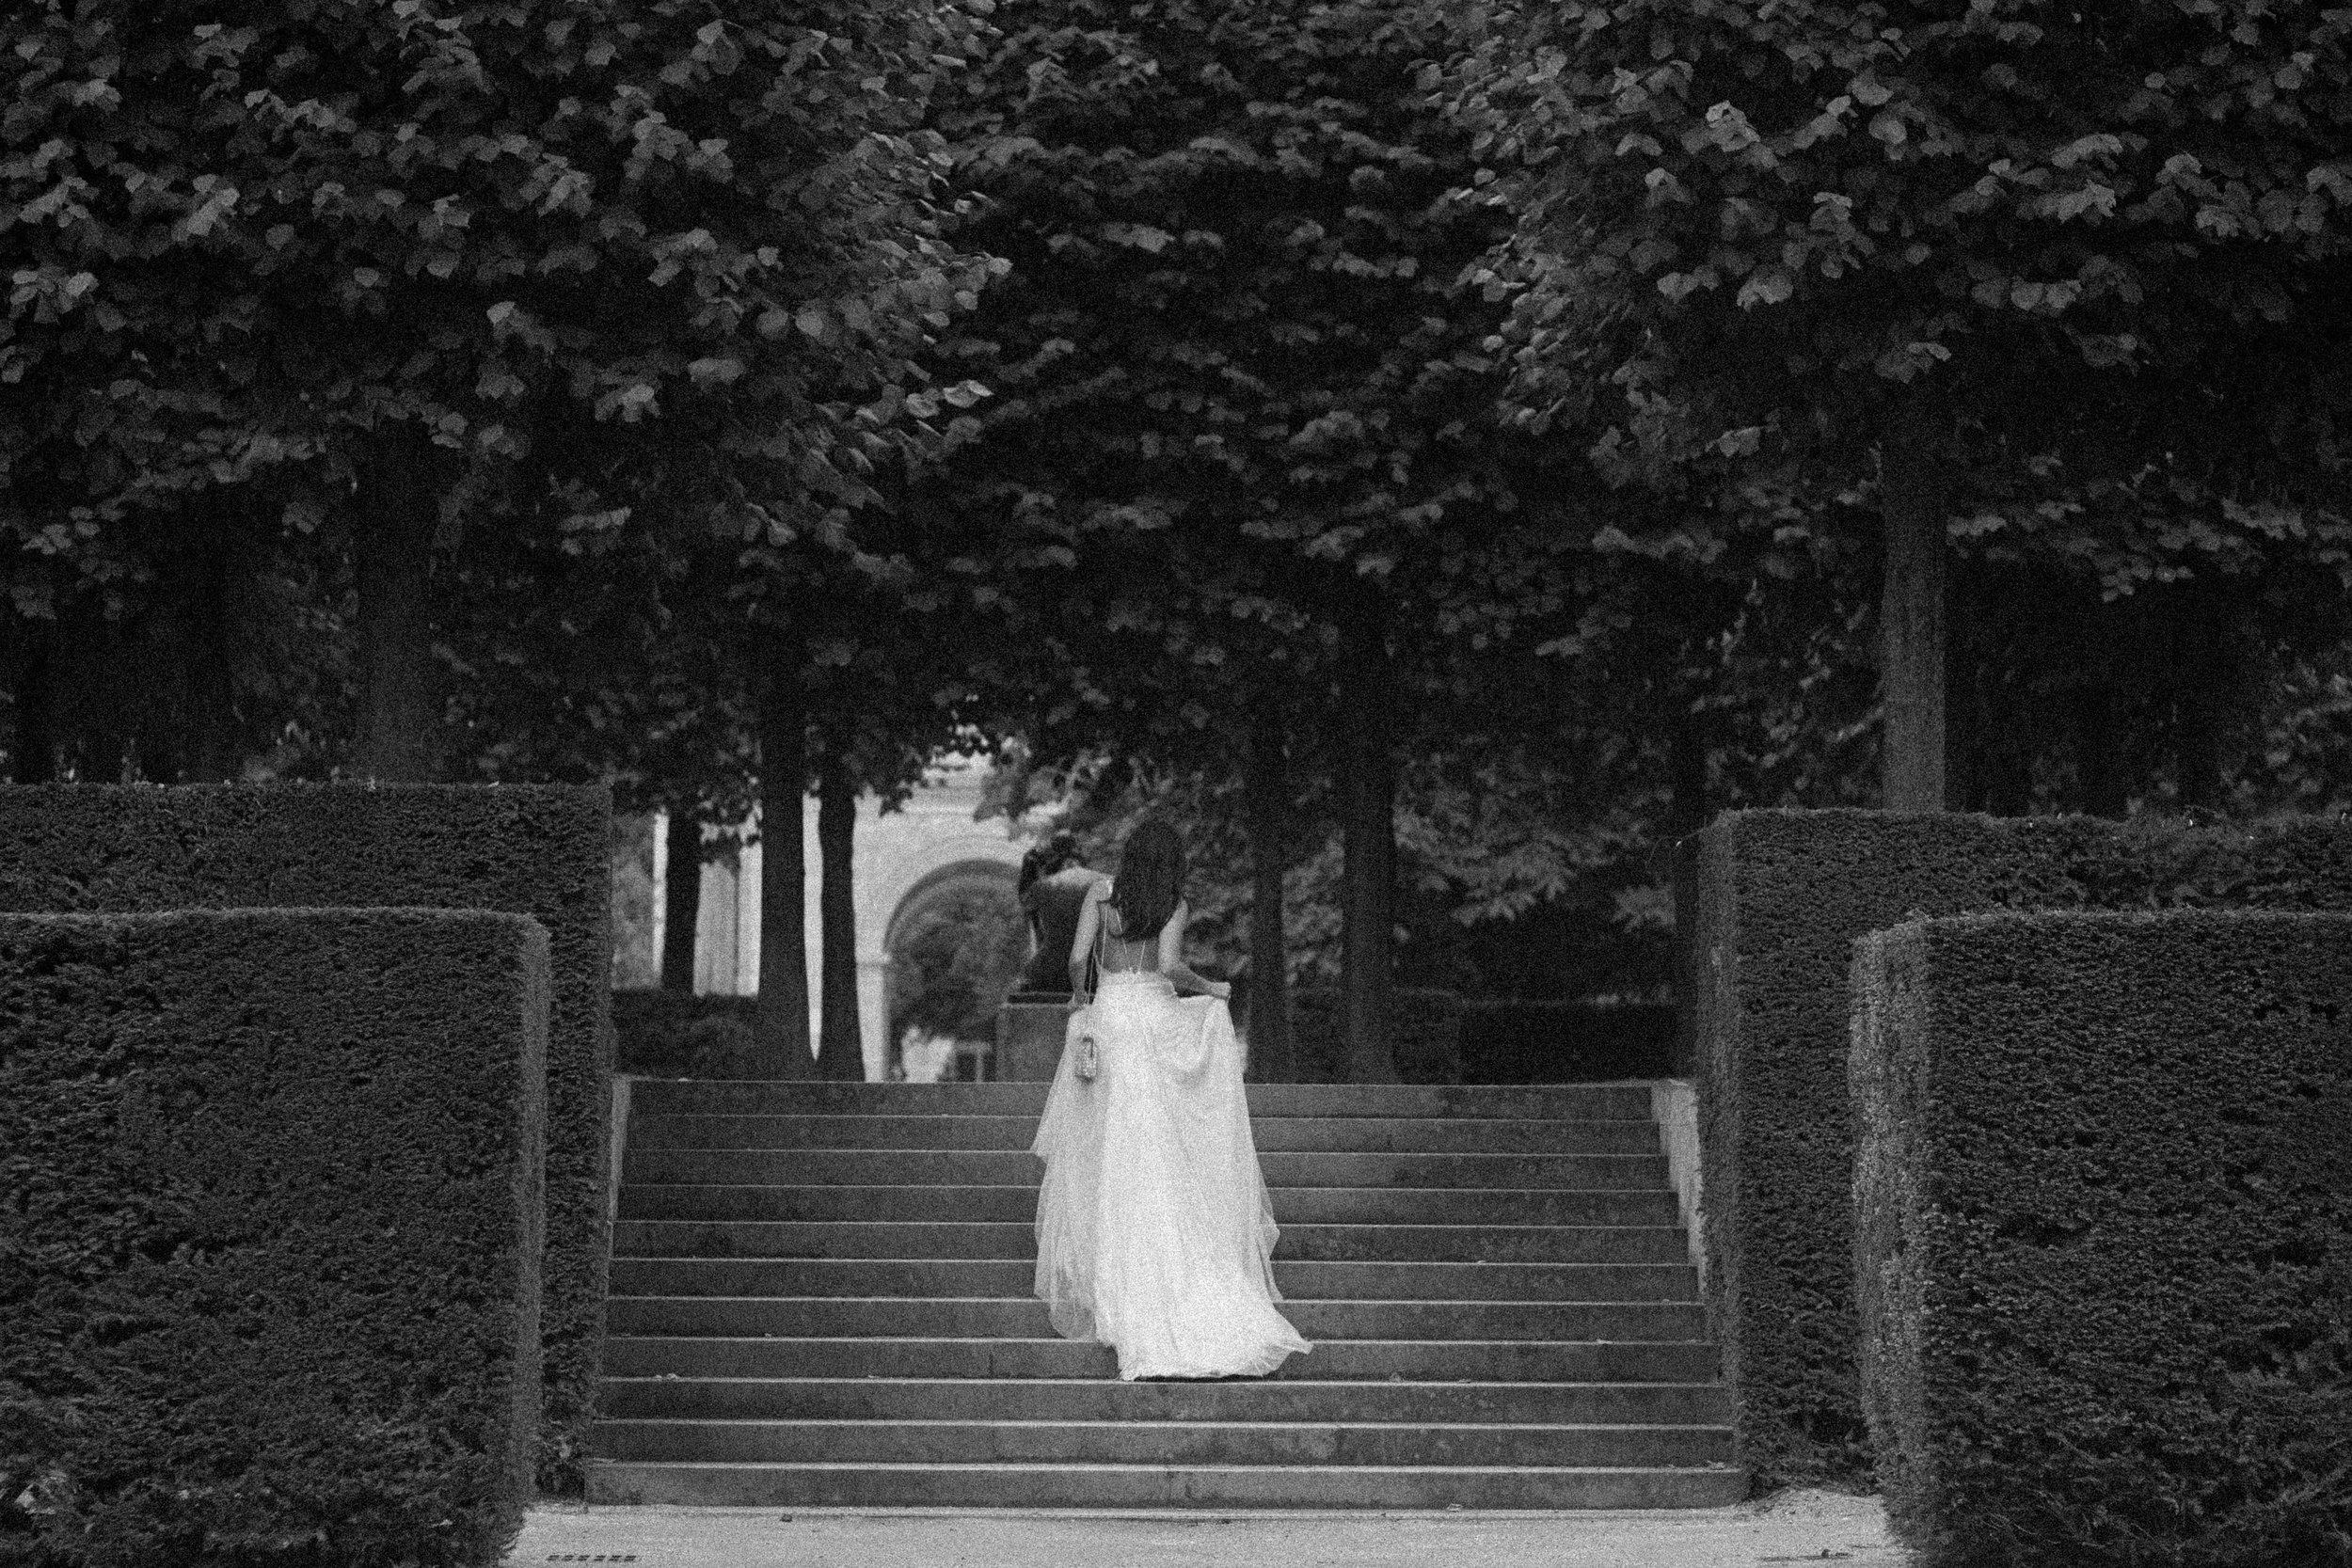 paris wedding photographer craig george hannah and mitch elopment-130.jpg